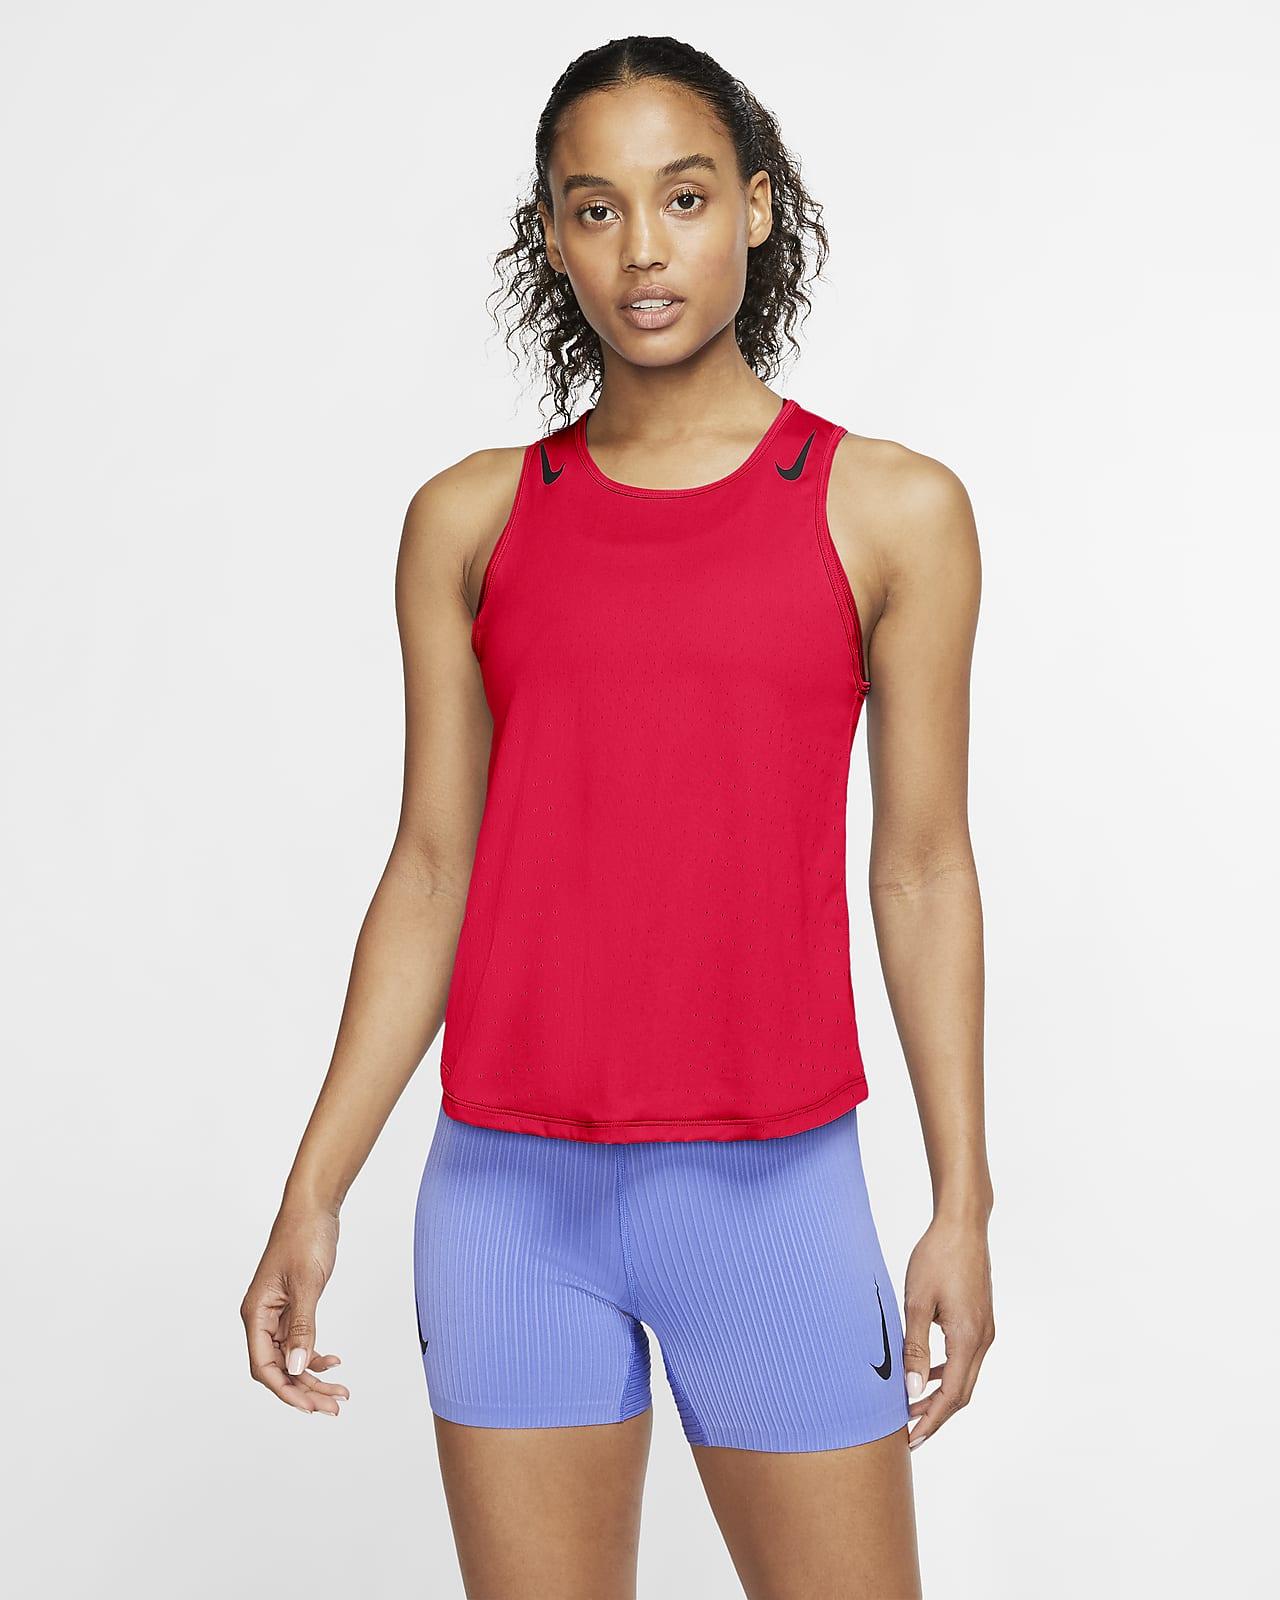 Camisola de running sem mangas Nike AeroSwift para mulher